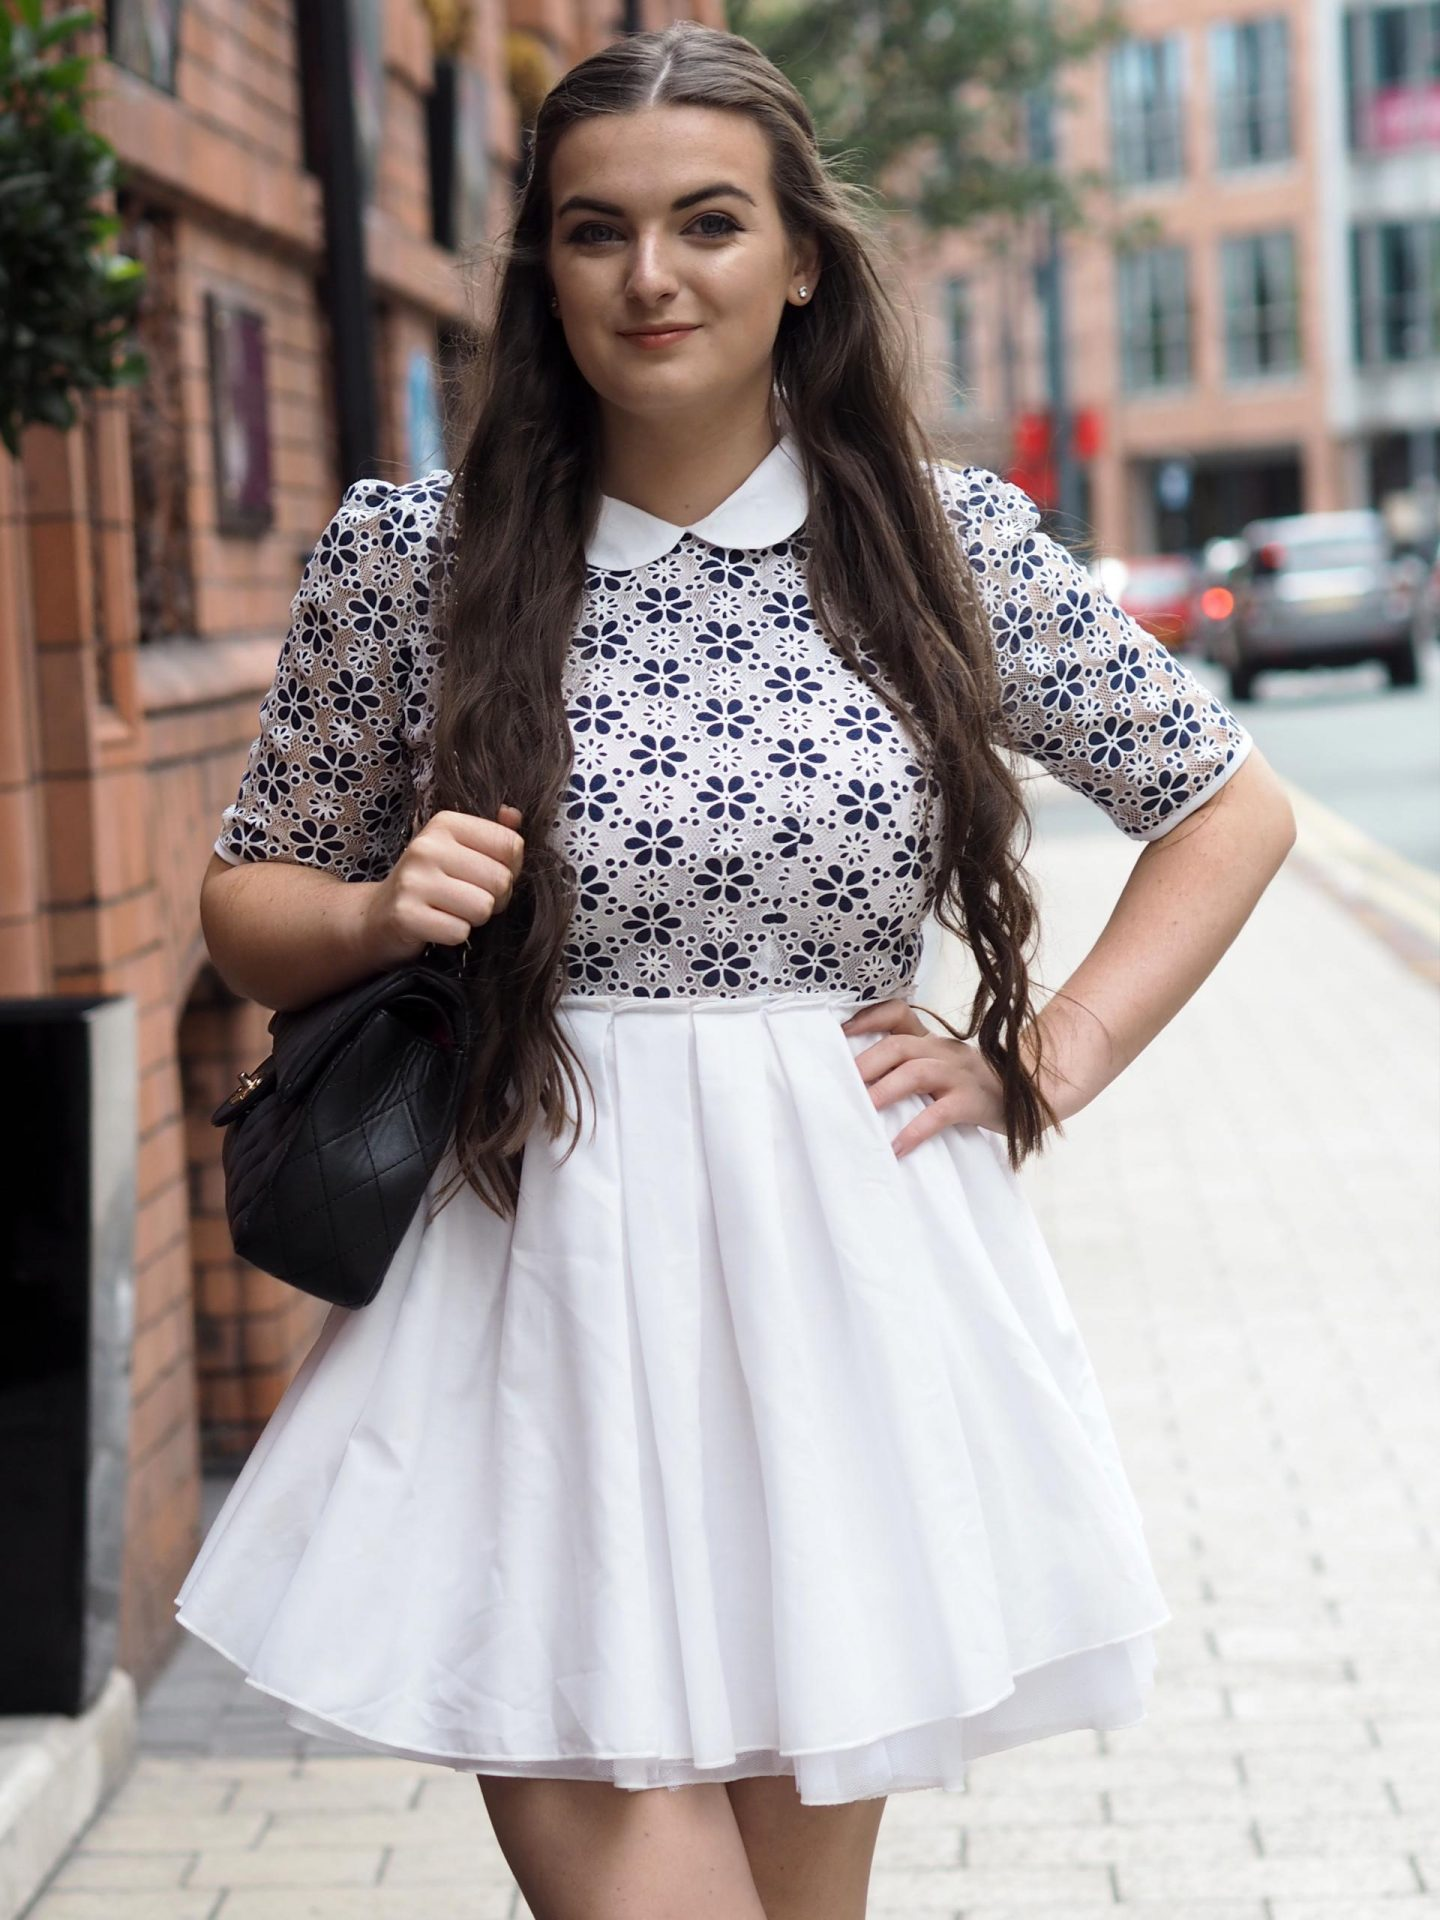 Summer Part Ready, Jones & Jones Audrey Dress - Rachel Nicole UK Style Blogger 3